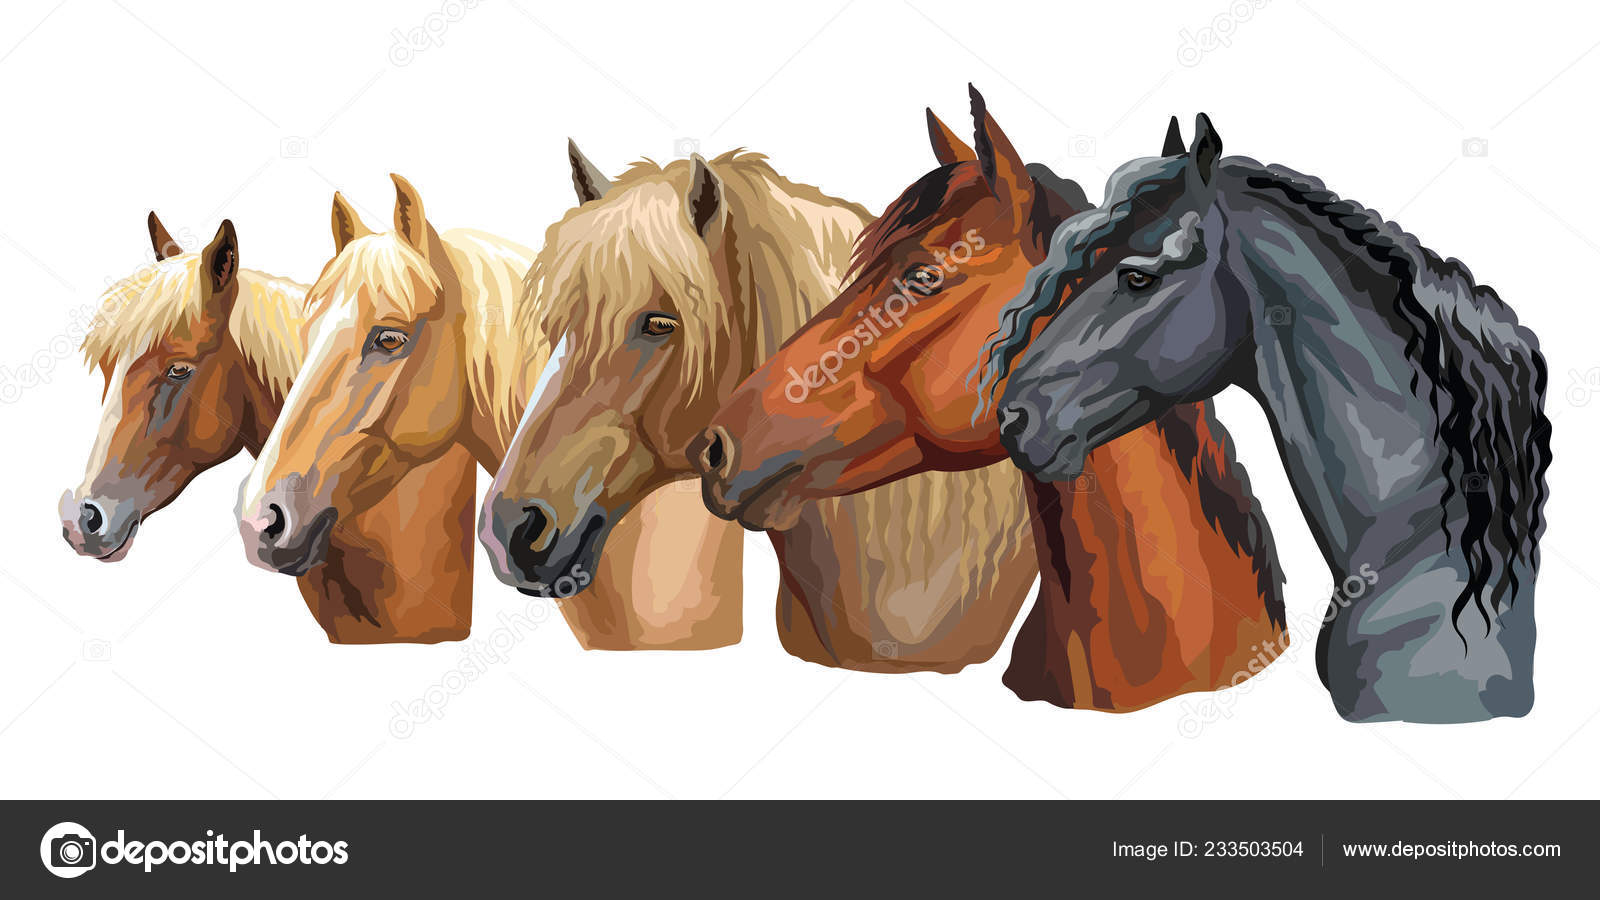 Set Colorful Vector Portraits Horses Breeds Looking Profile Russian Heavy Stock Vector C Alinart 233503504